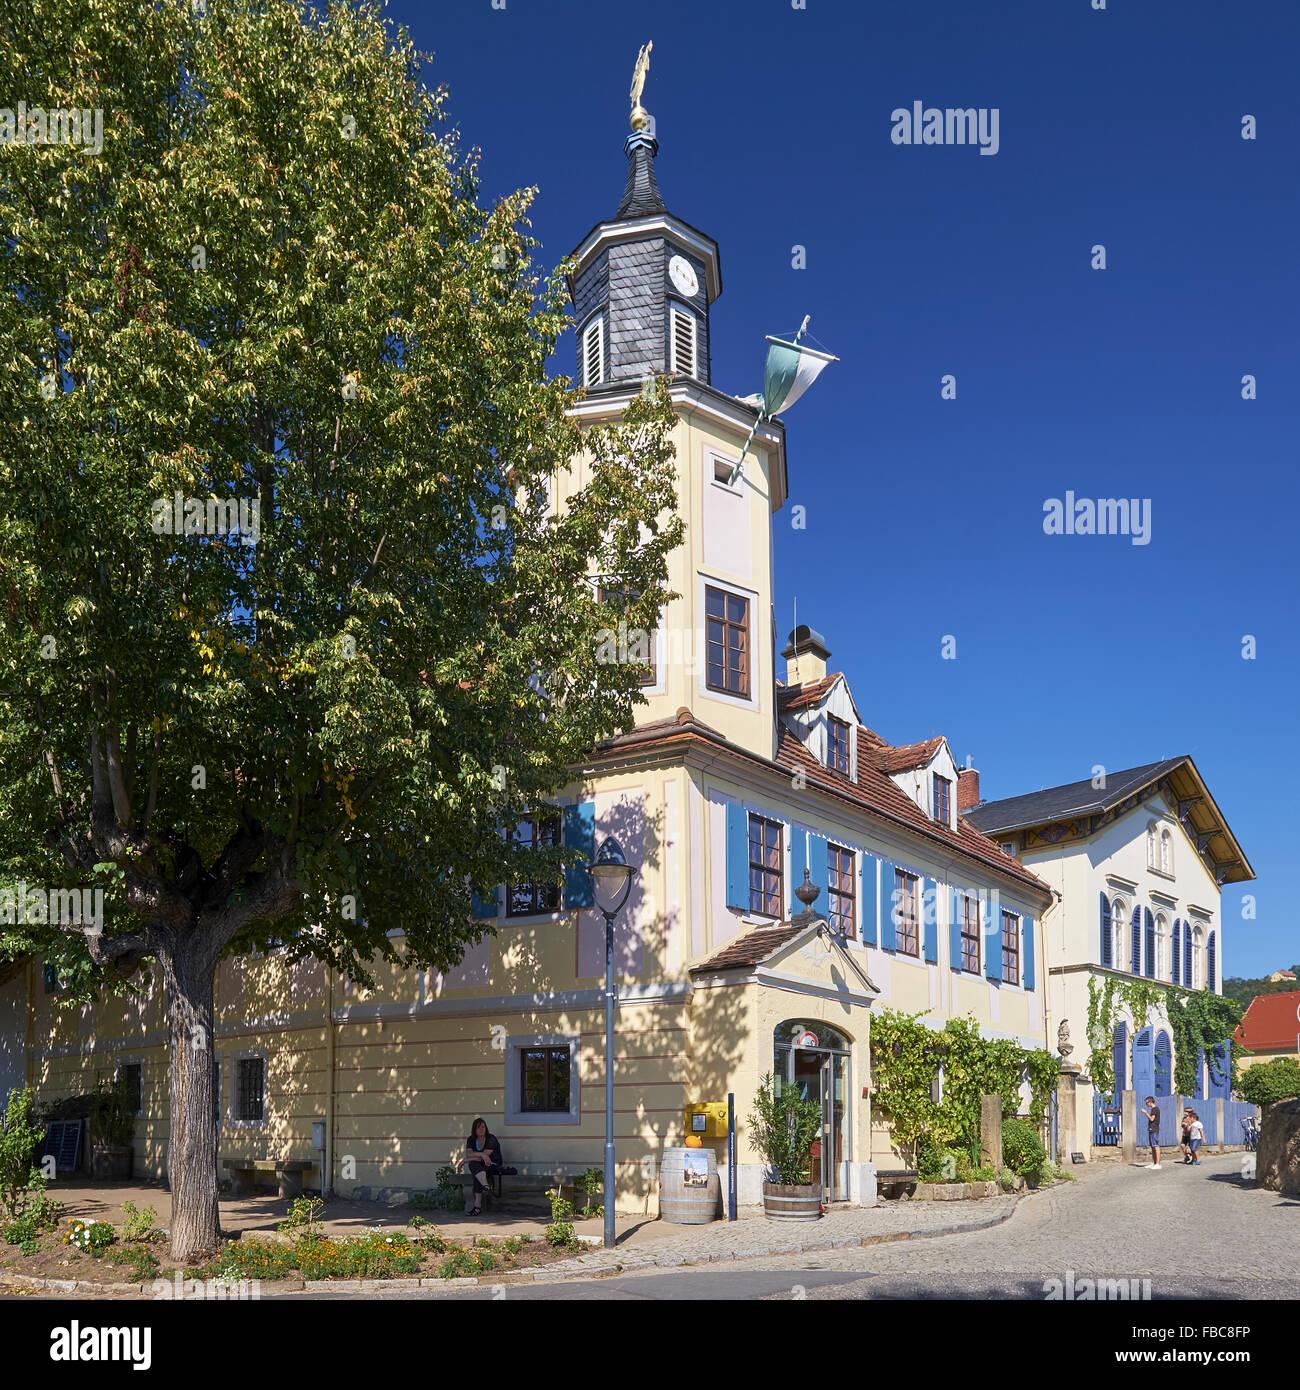 Meinhold tower house, Radebeul, Germany - Stock Image